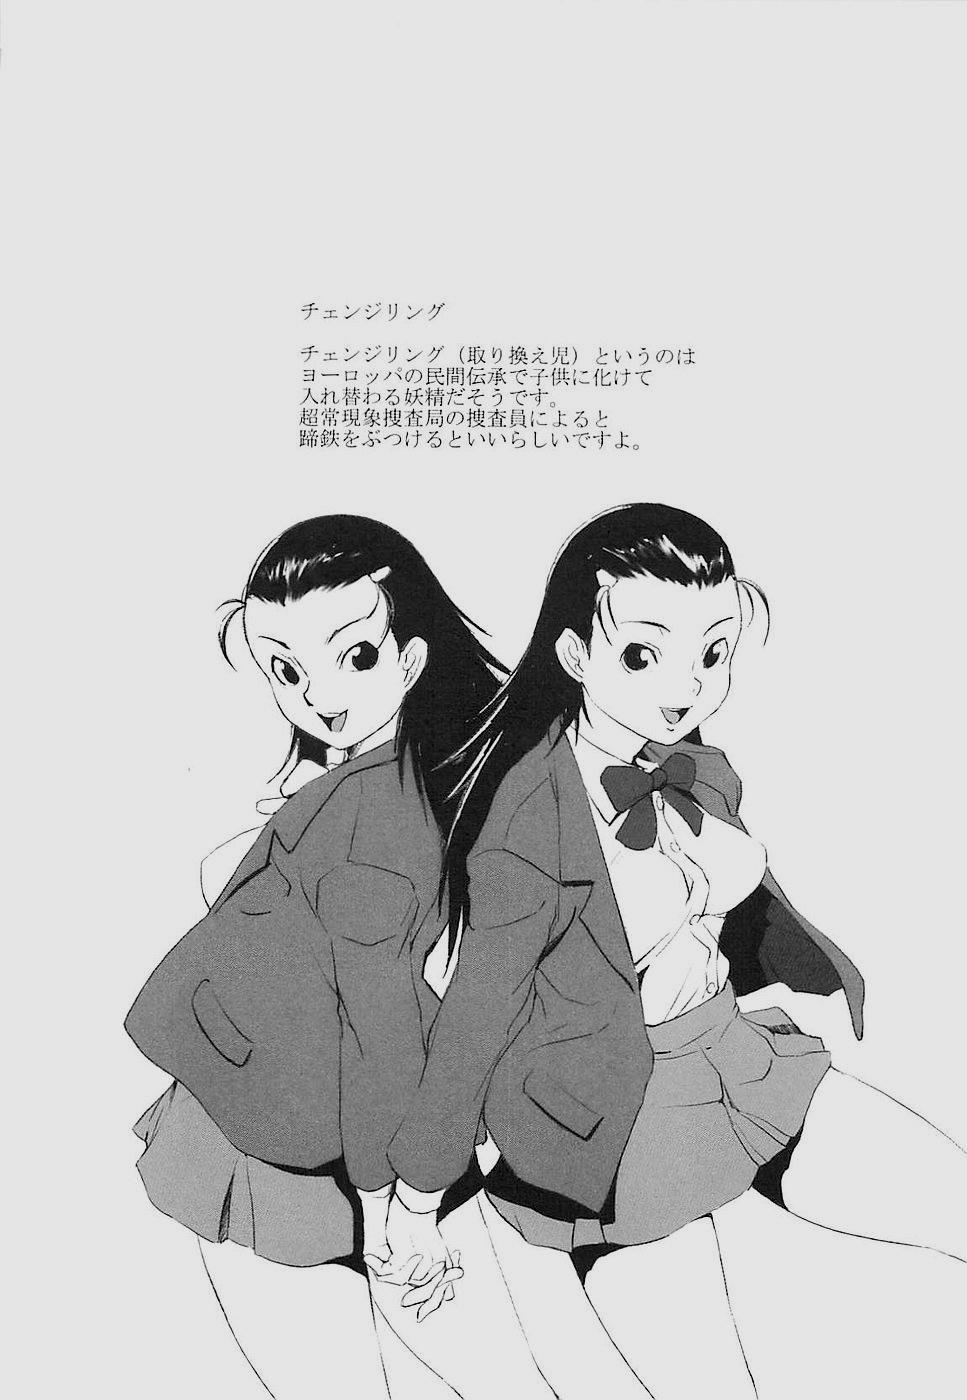 Inkoukamitsu 191